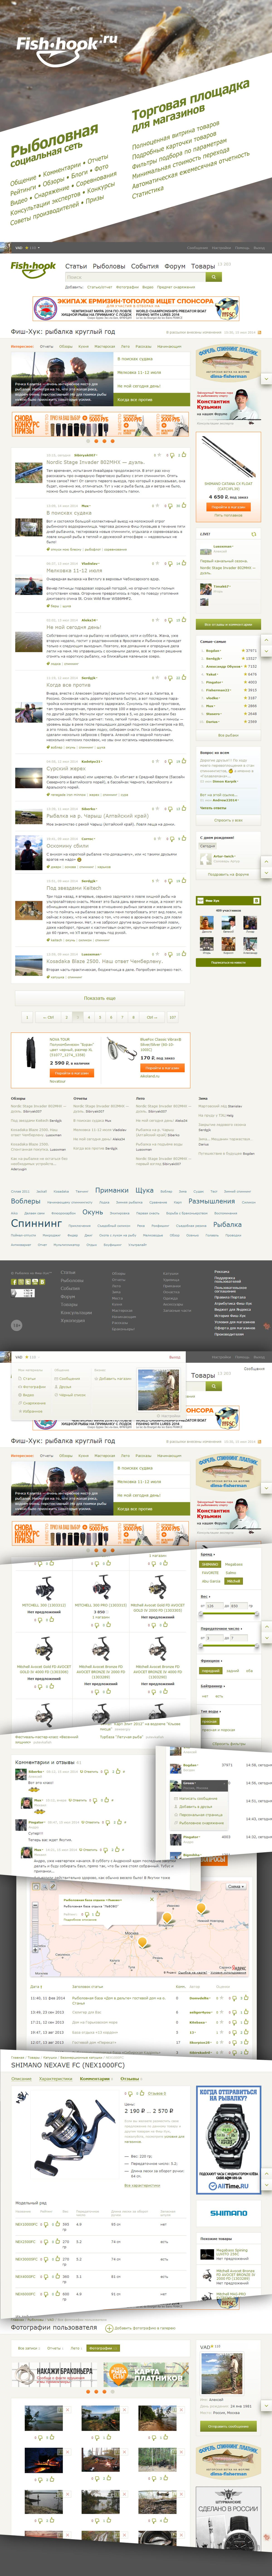 Фиш-Хук / Проект компании MNWB branding & design agency